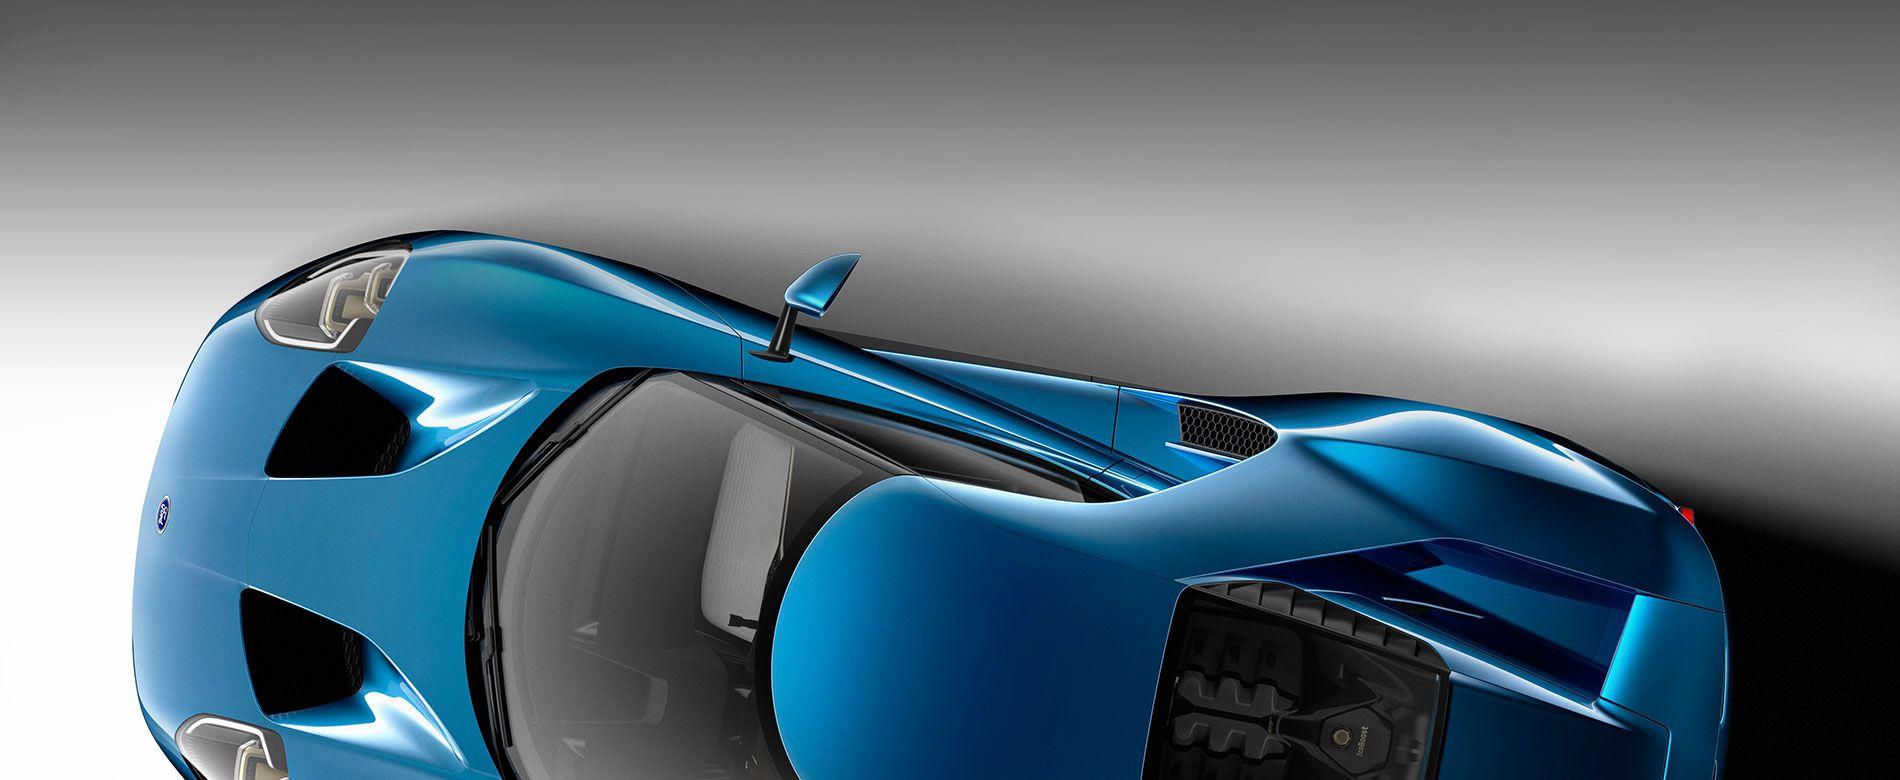 Allnew ford gt sets new standard for ford innovation